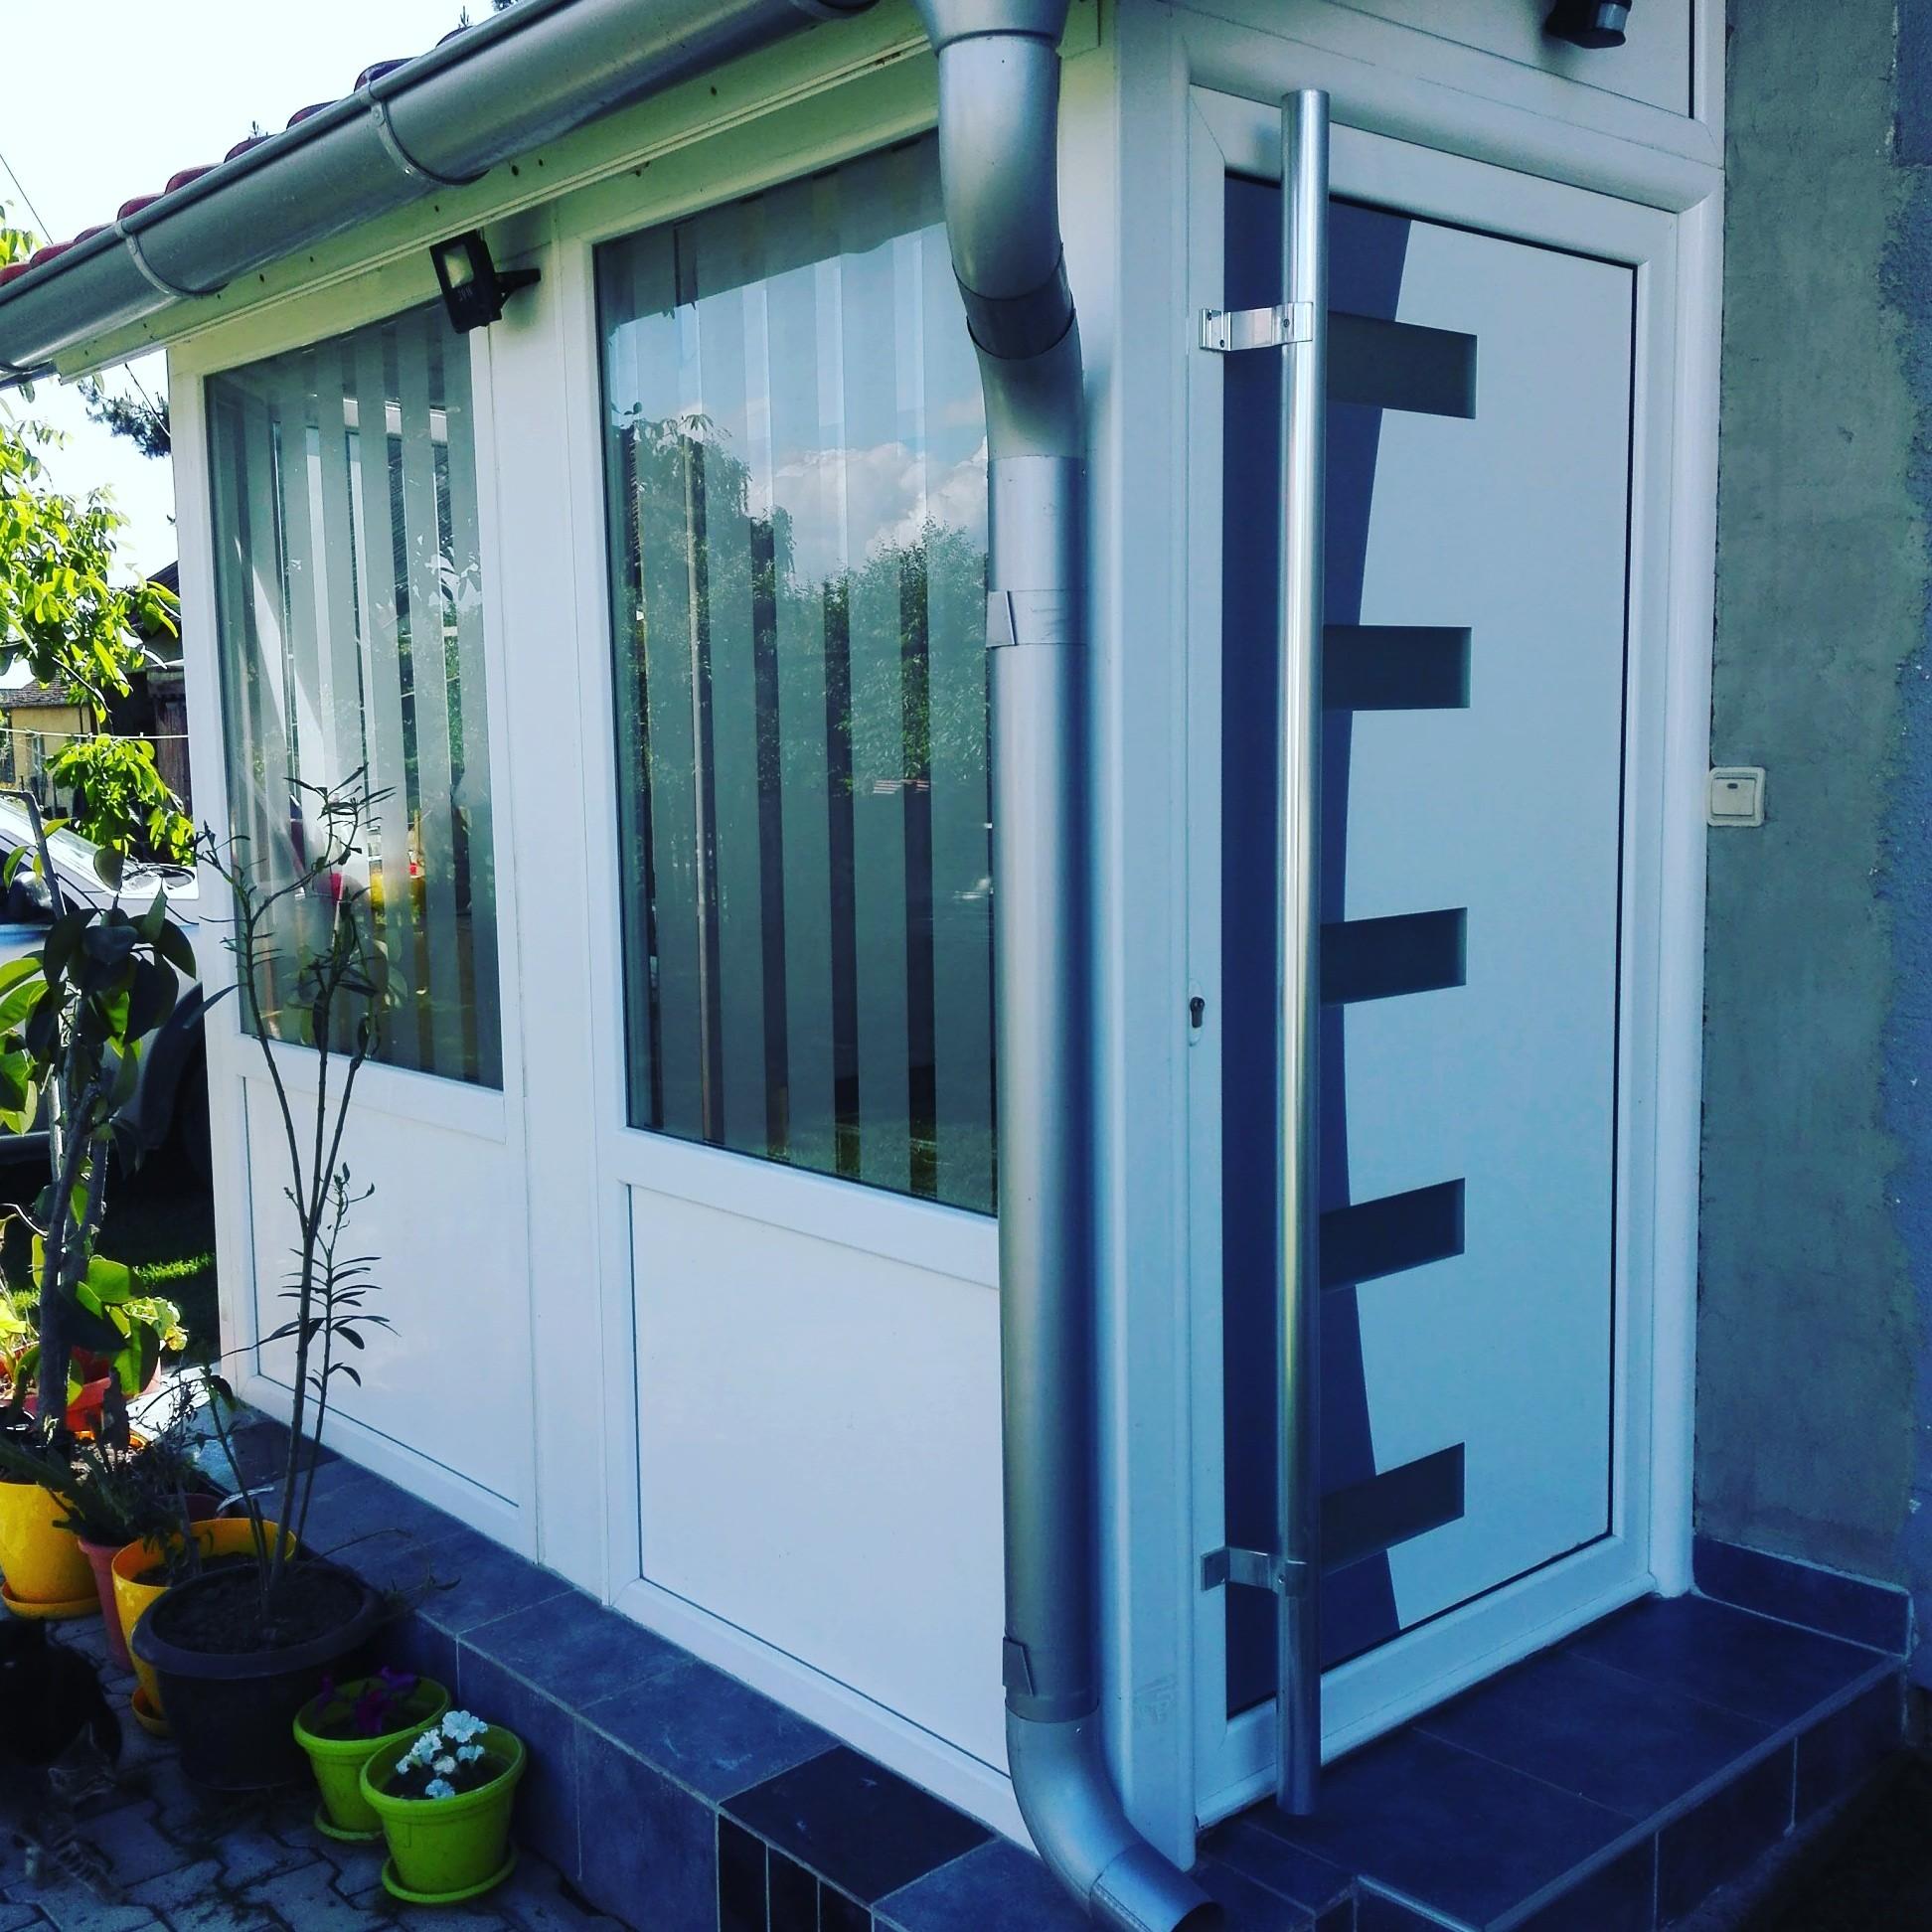 PVC Stolarija SIegeln - Šabac - Majur Svetog Save 6, Majur 0693762992 www.siegeln.rs Najkvalitetnija PVC Stolarija